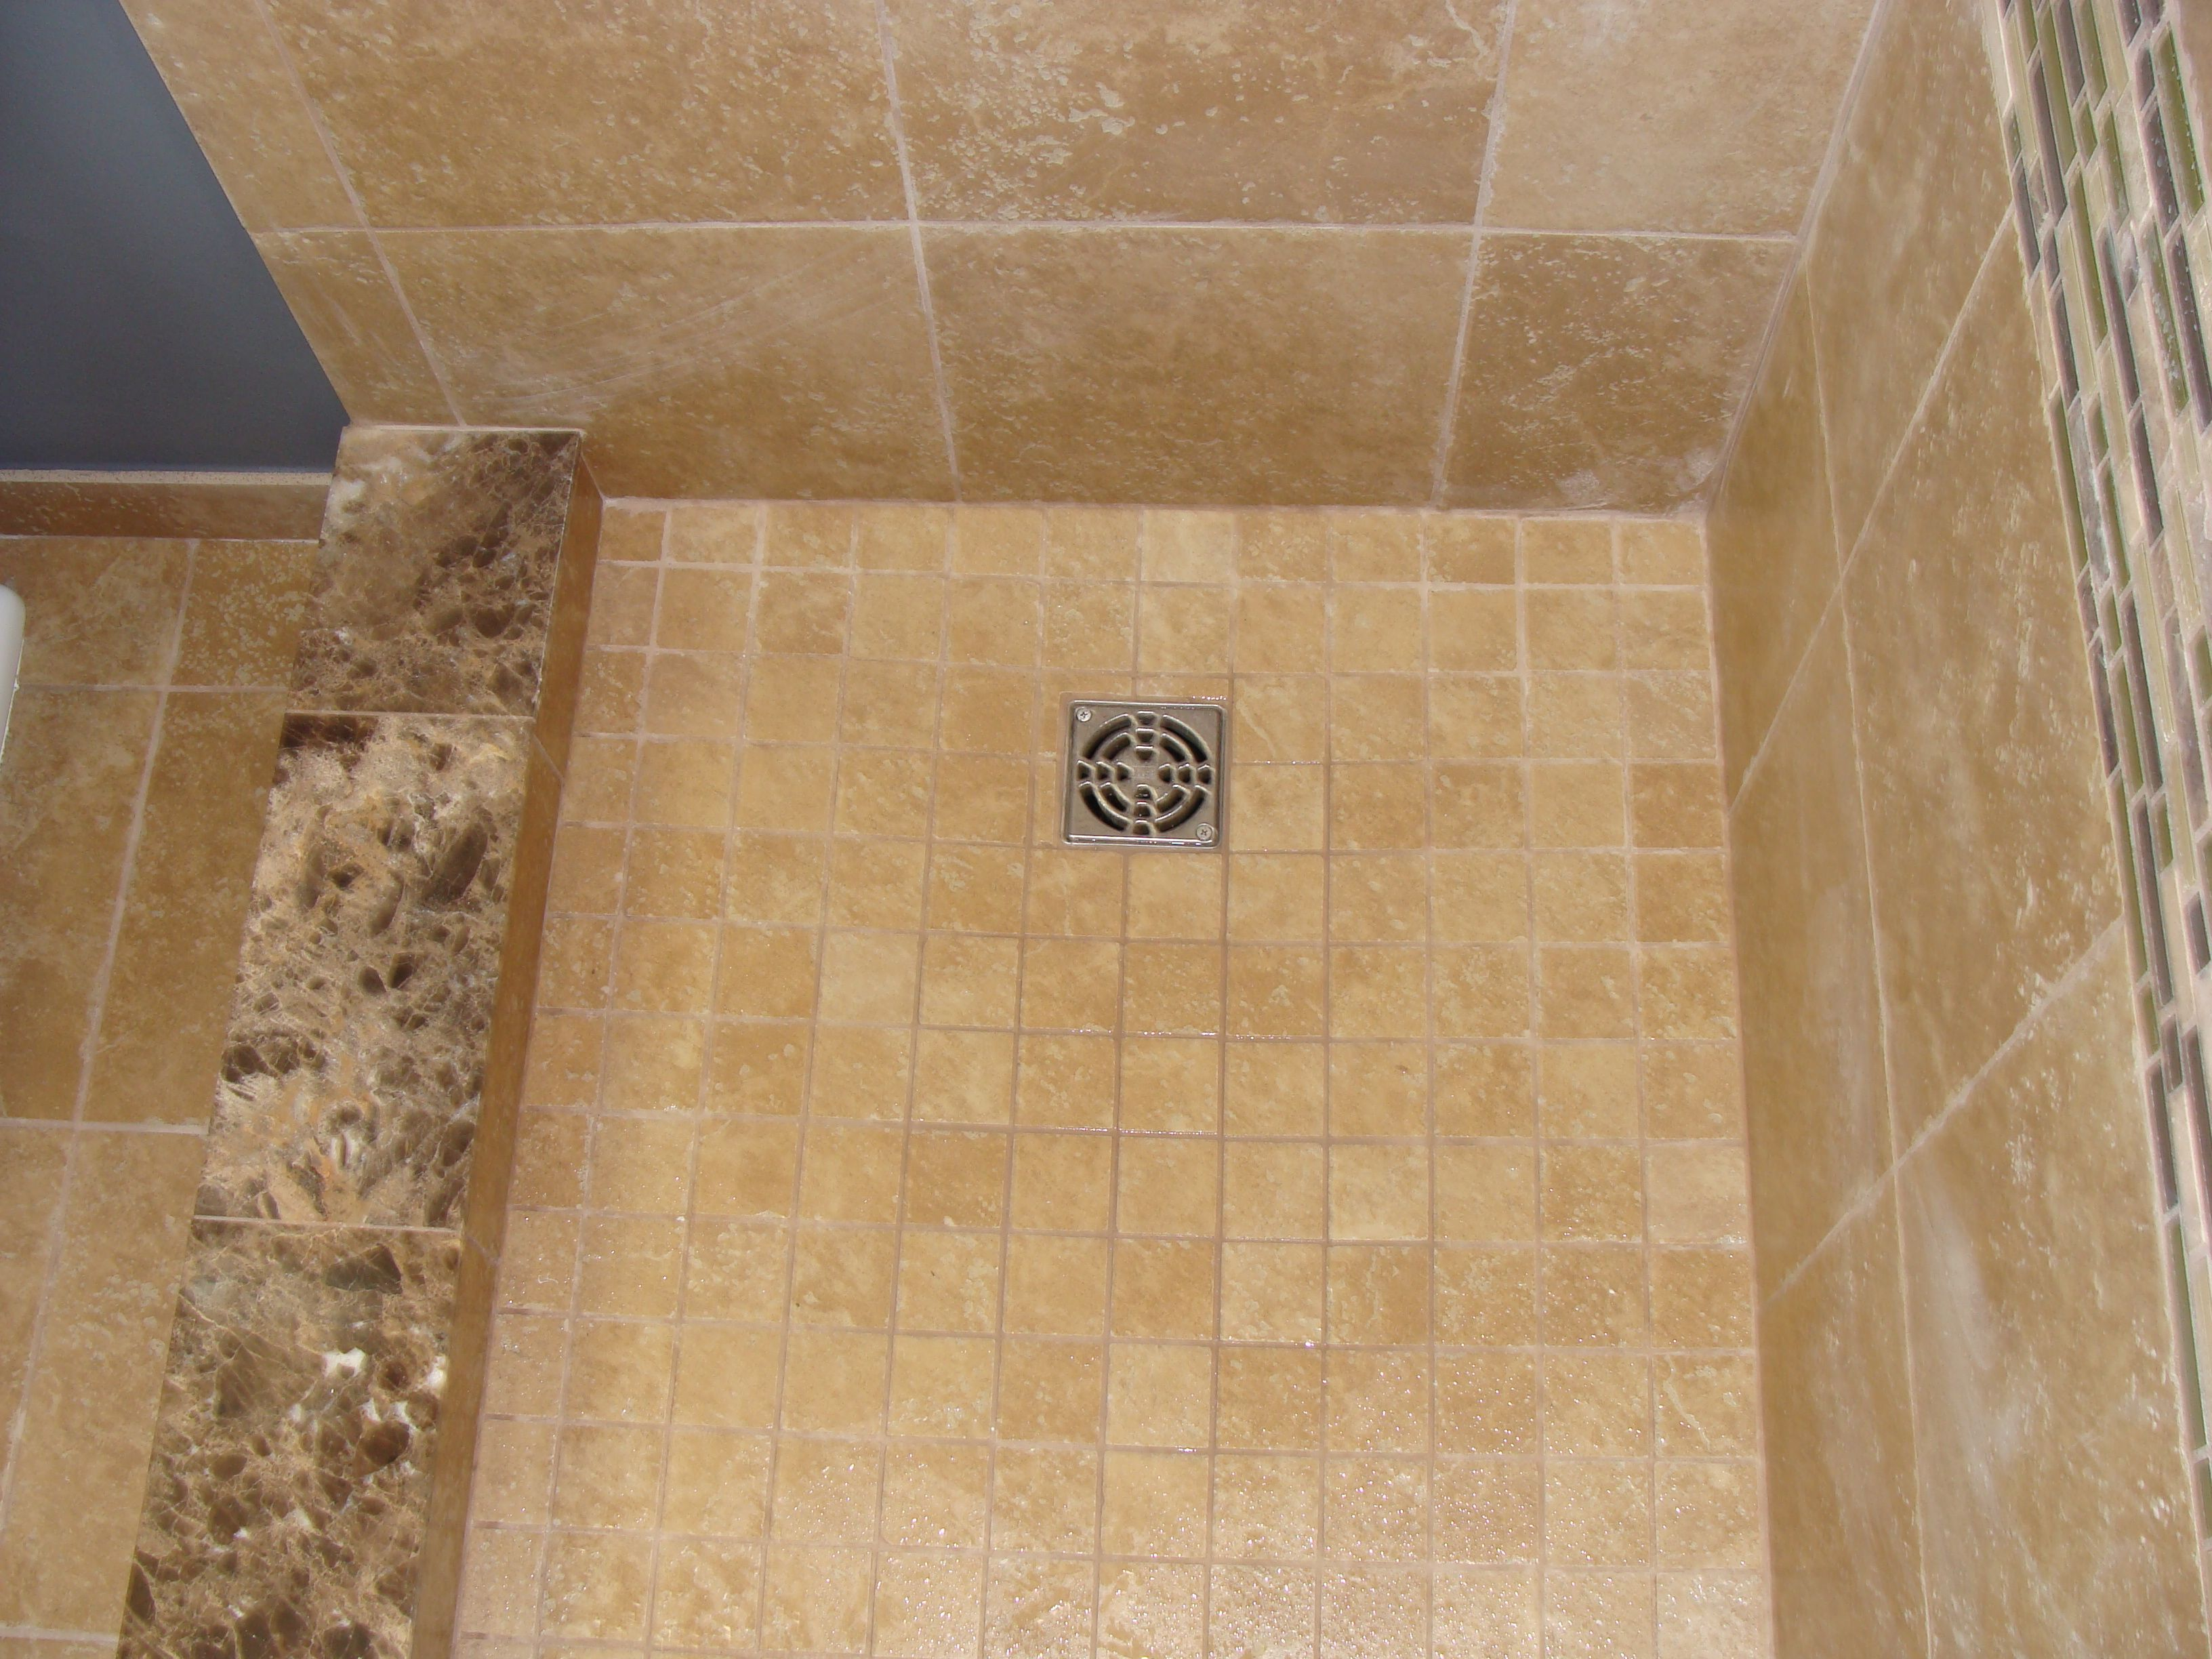 Mosaic Tile Shower: Marble Shower Curb Mosaic Tile Shower Pan